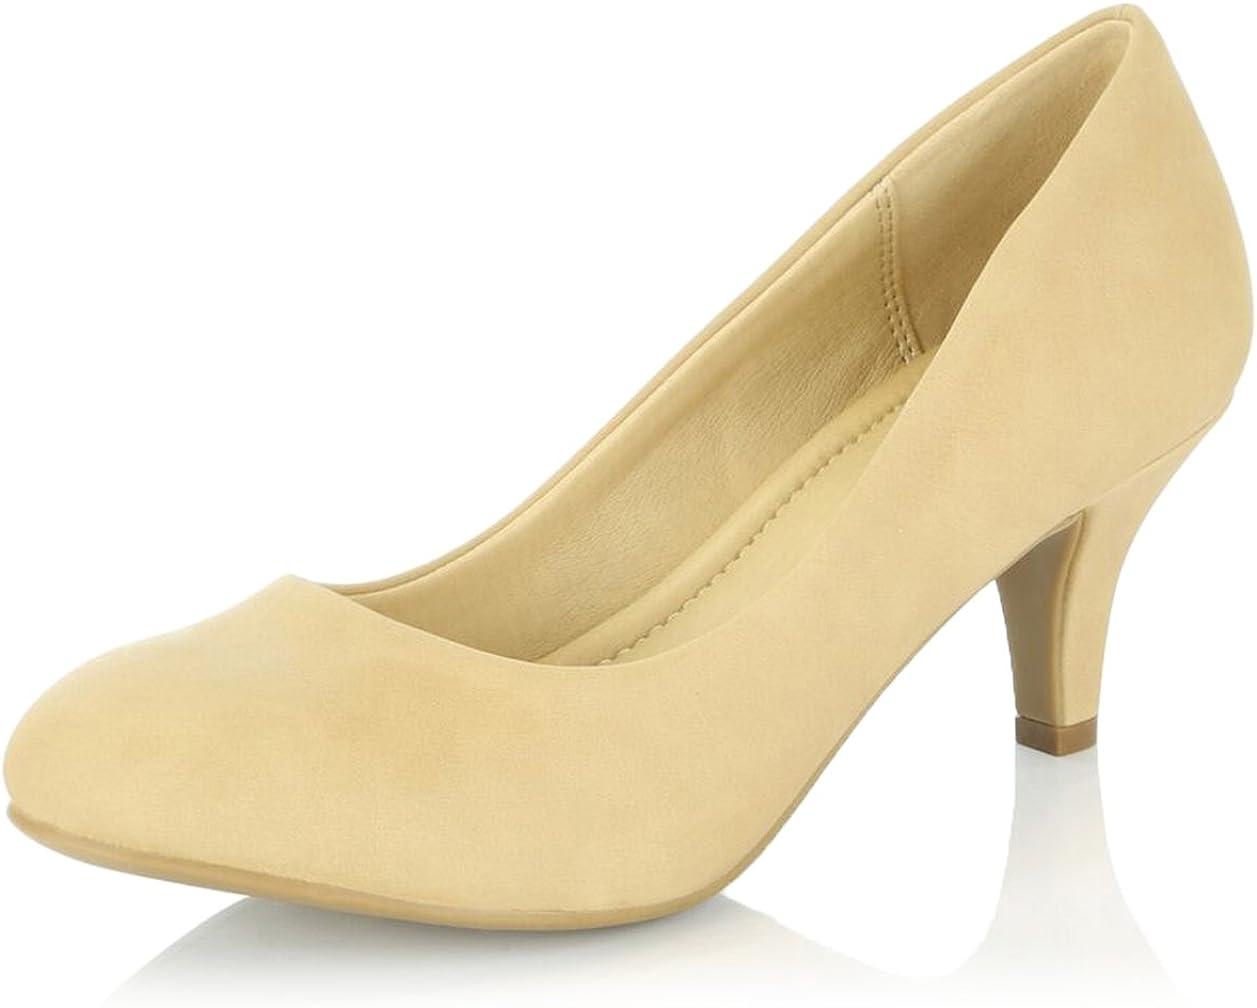 DailyShoes Women's Comfortable Elegant